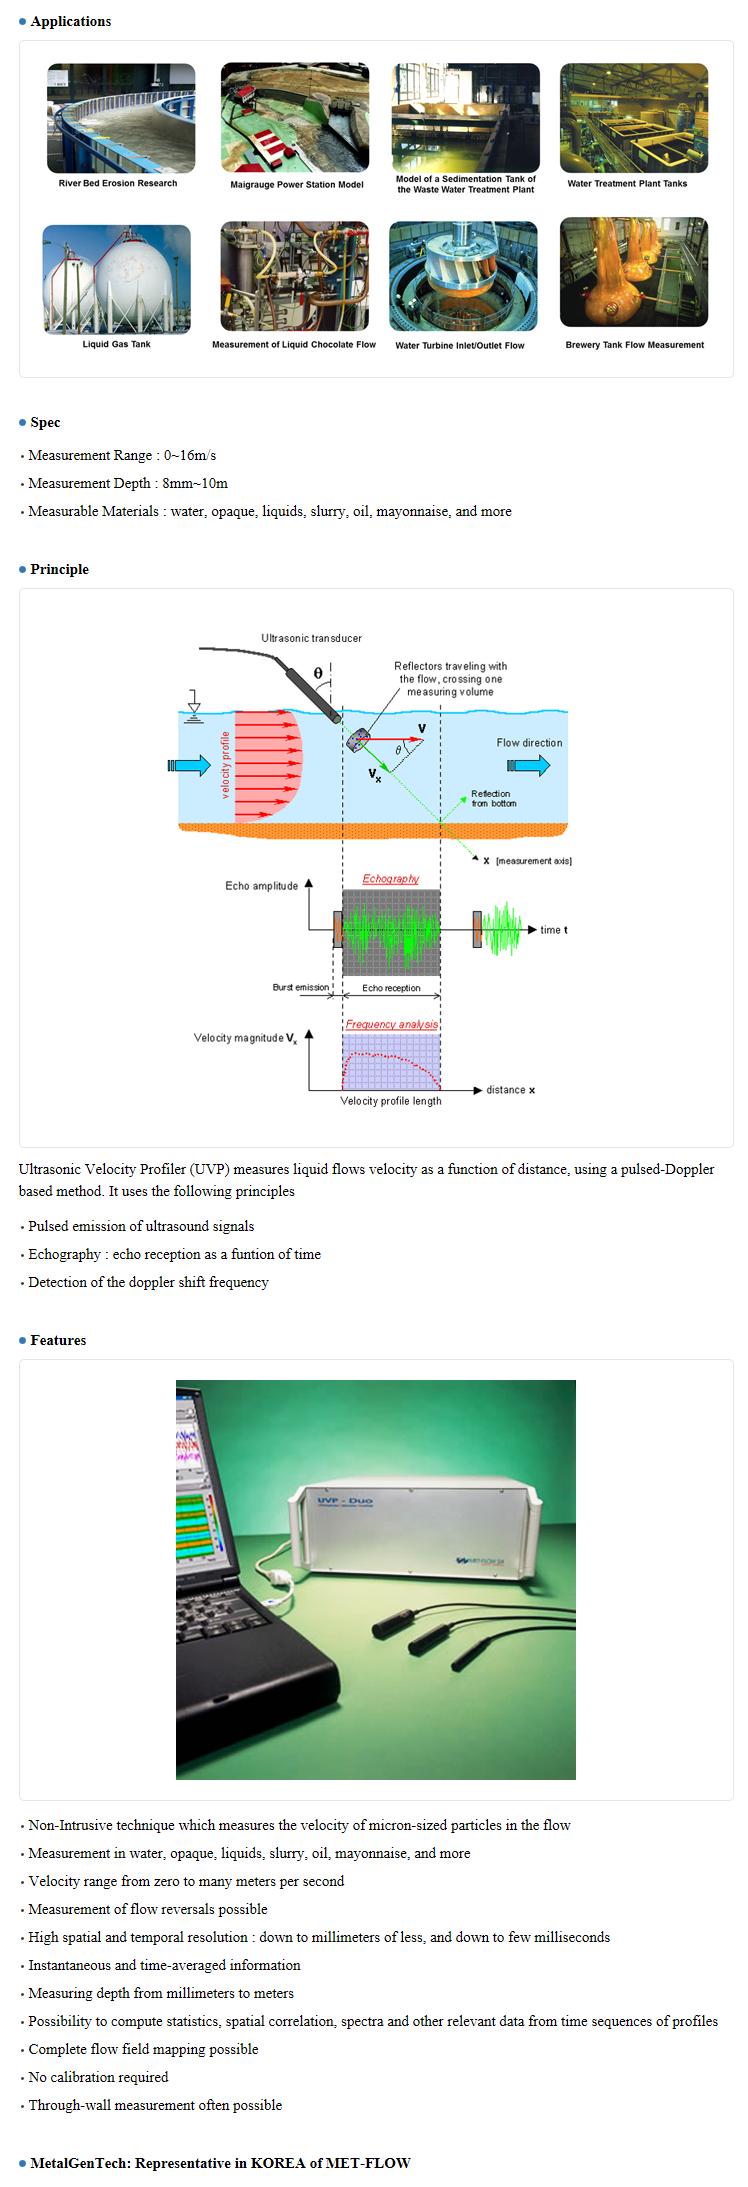 MetalGenTech Ultrasonic Velocity Profiling